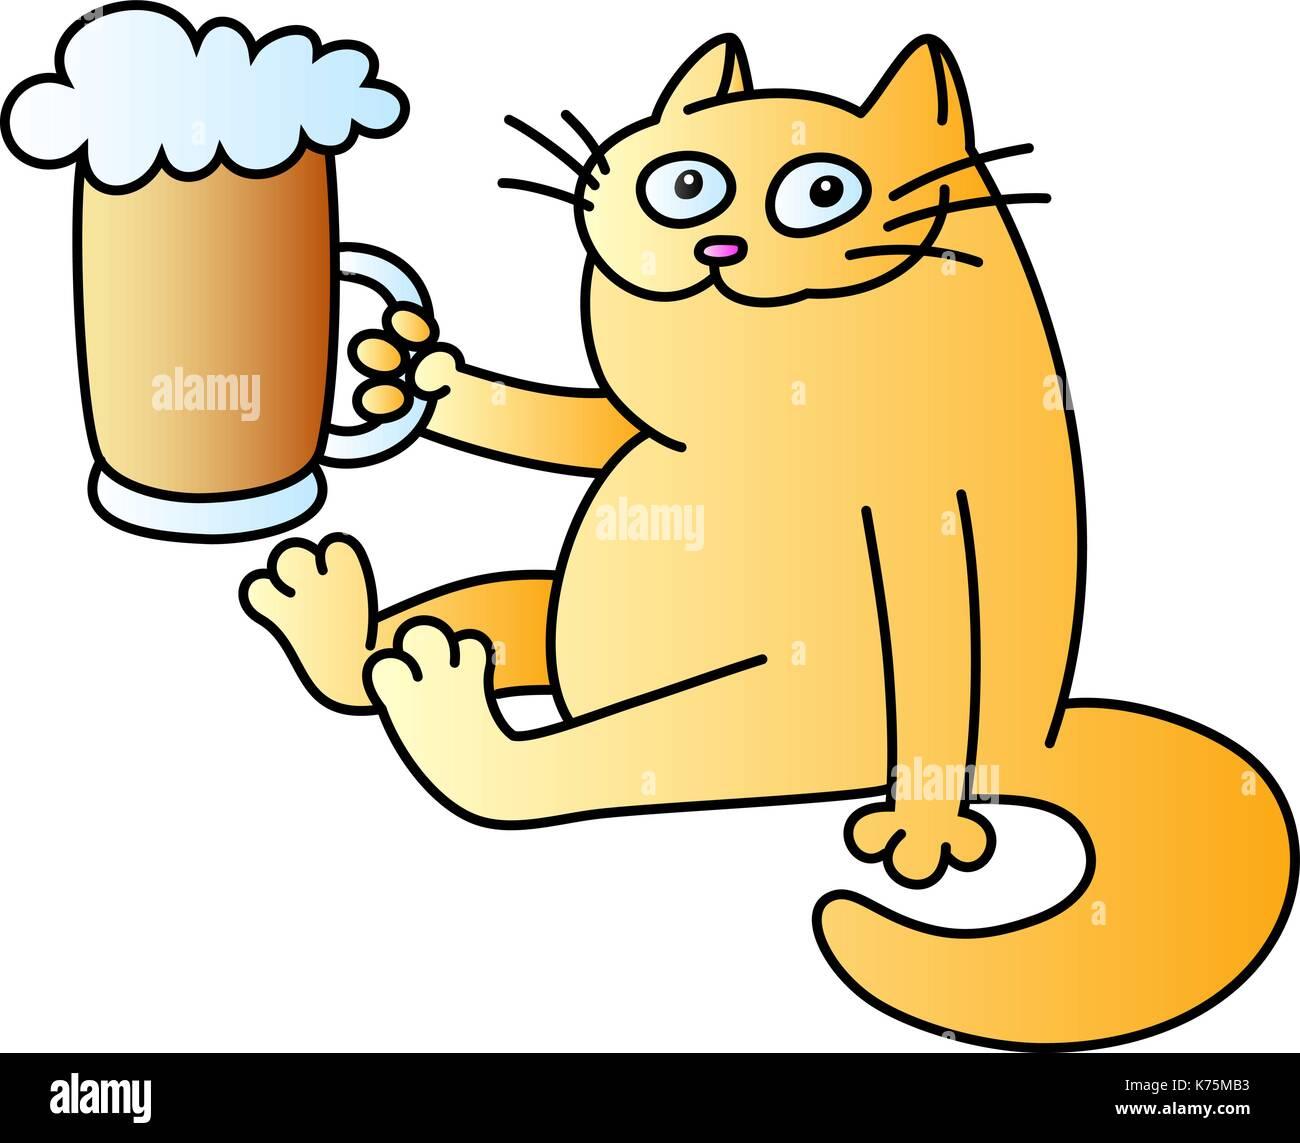 Cartoon Cat Orange With Black Stripes